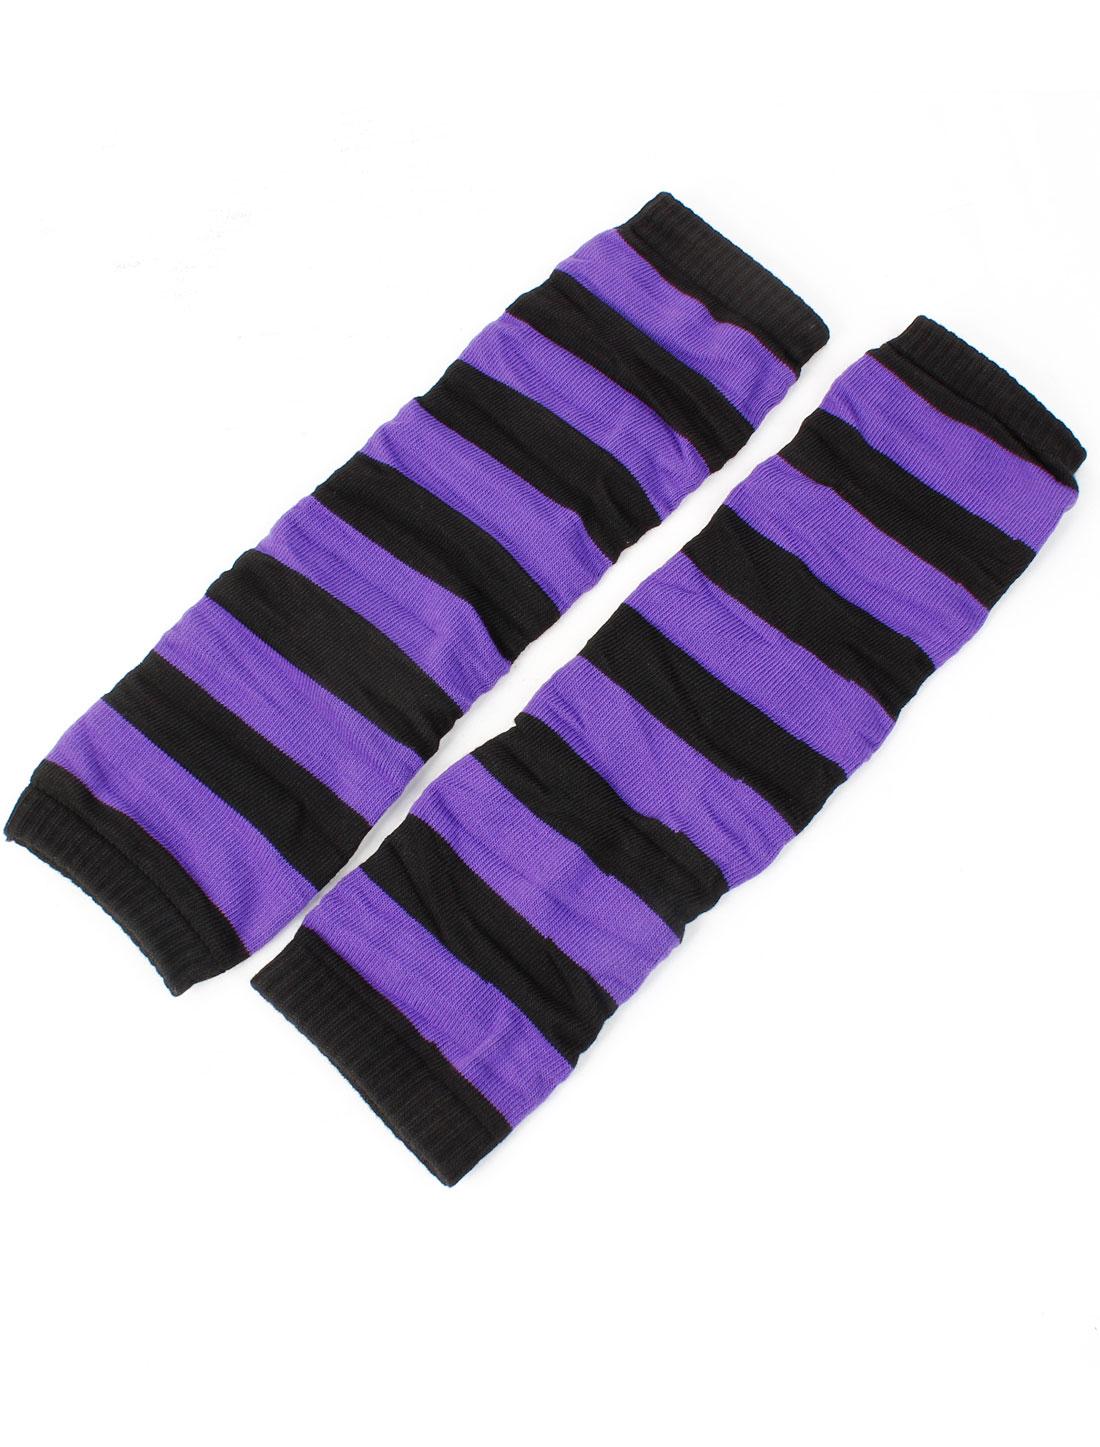 Ladies Purple Black Stripe Print Toeless Elastic Winter Leg Warmer Socks Pair